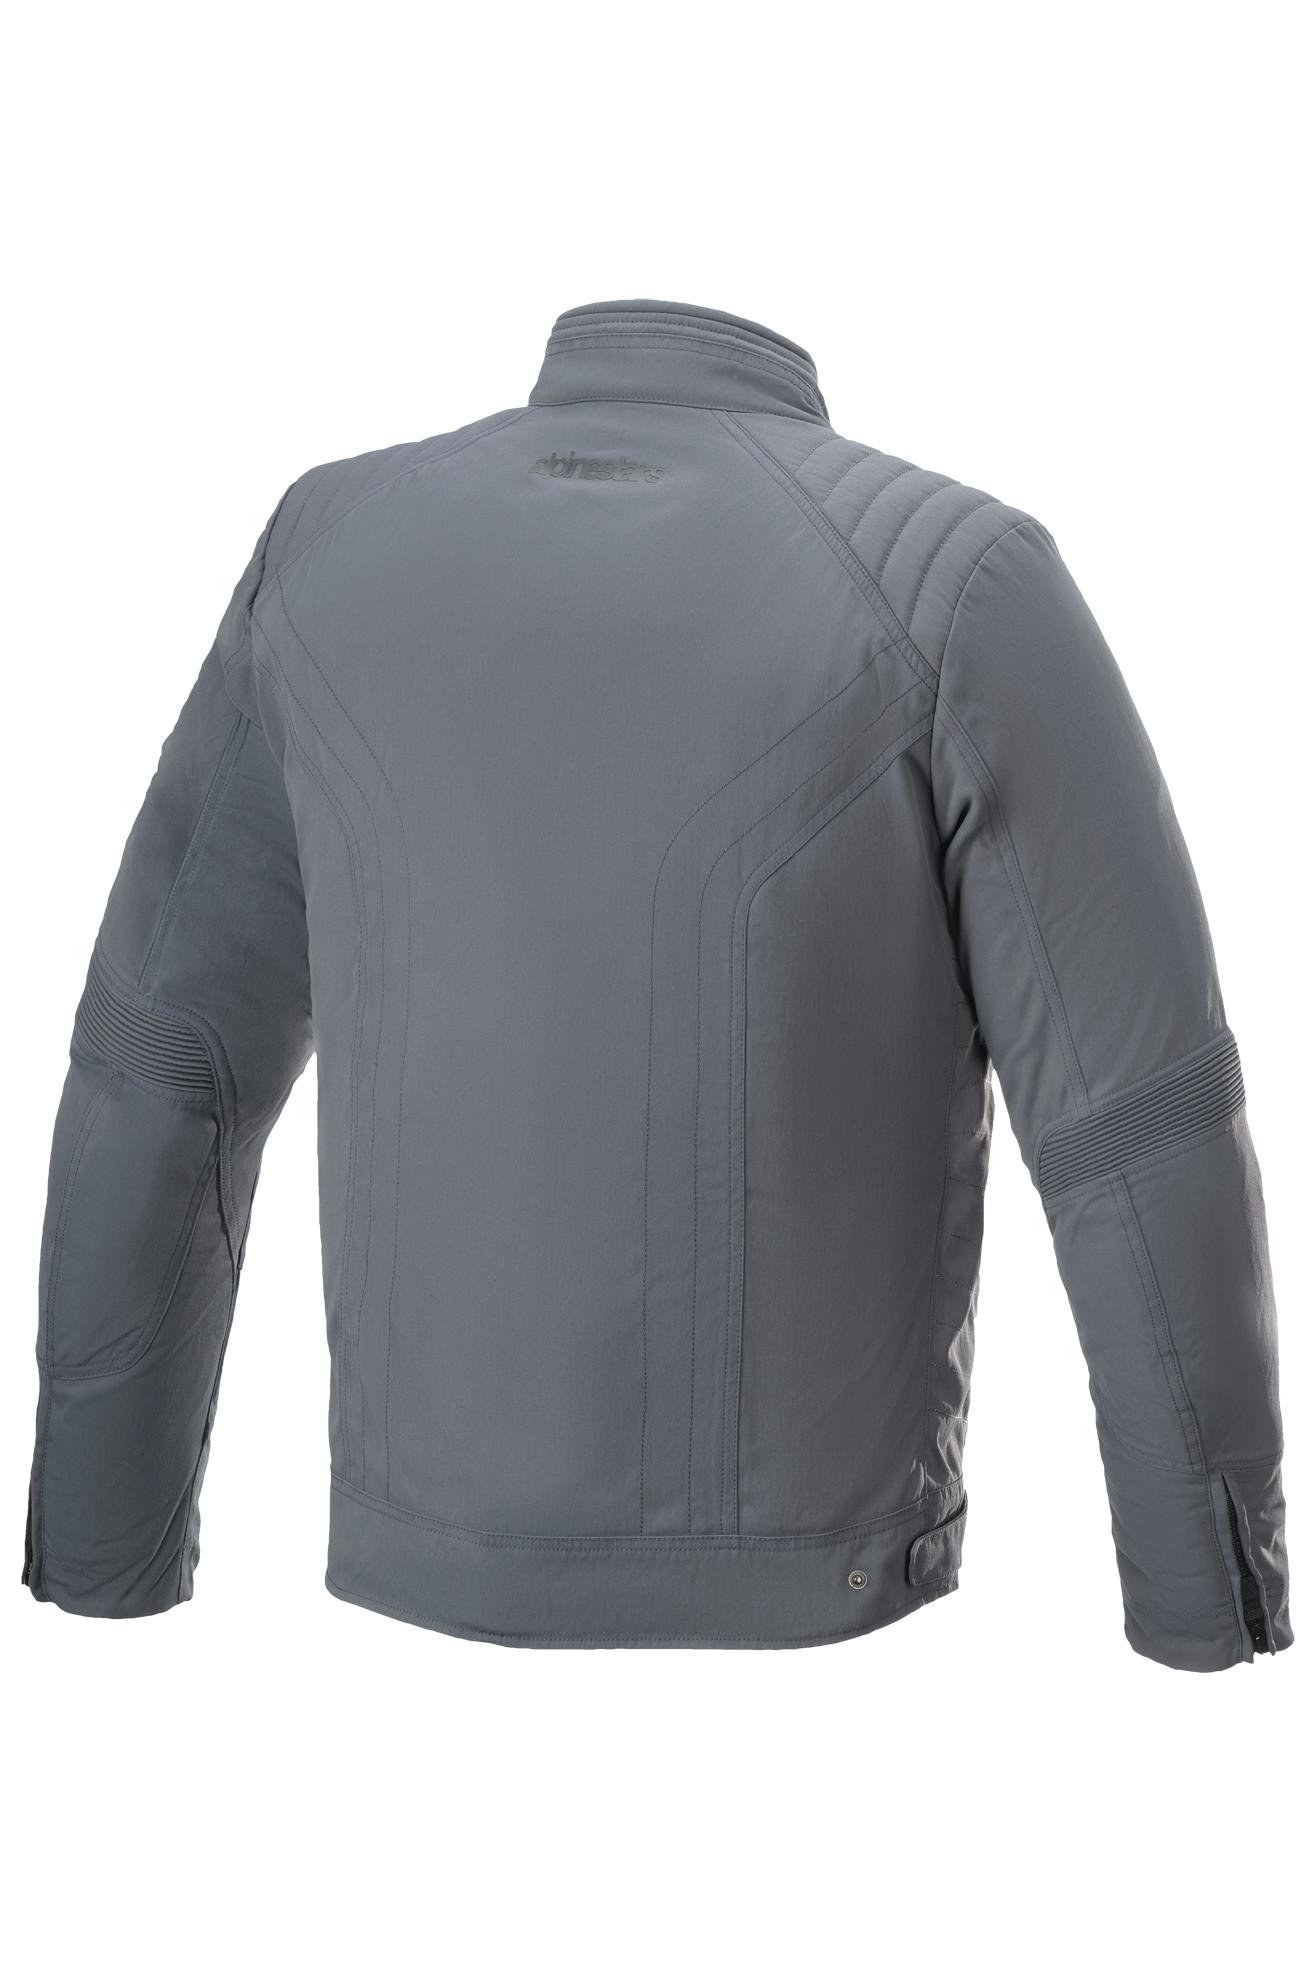 alpinestars giacca moto  t-burstun drystar storm-grigio